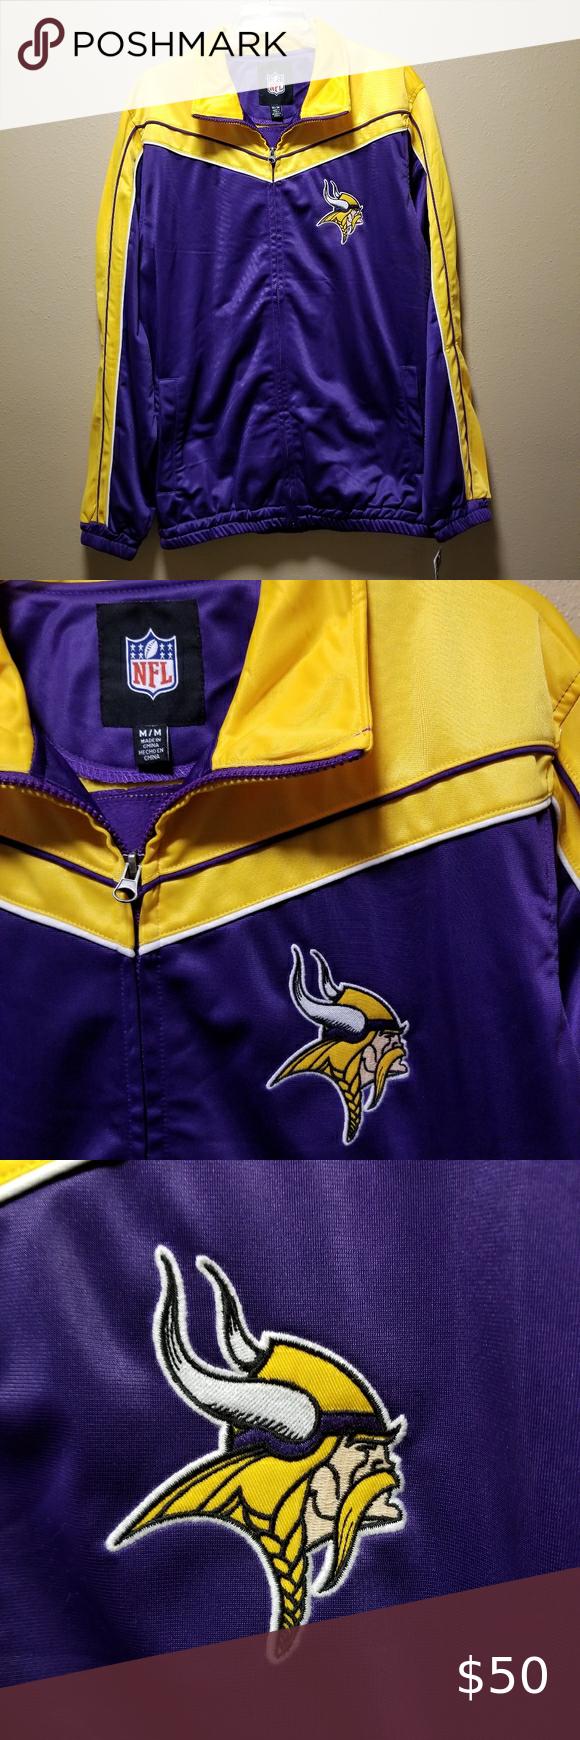 Men S Minnesota Vikings Track Jacket Nwt Track Jackets Clothing Brand Dallas Cowboys Leather Jacket [ 1740 x 580 Pixel ]